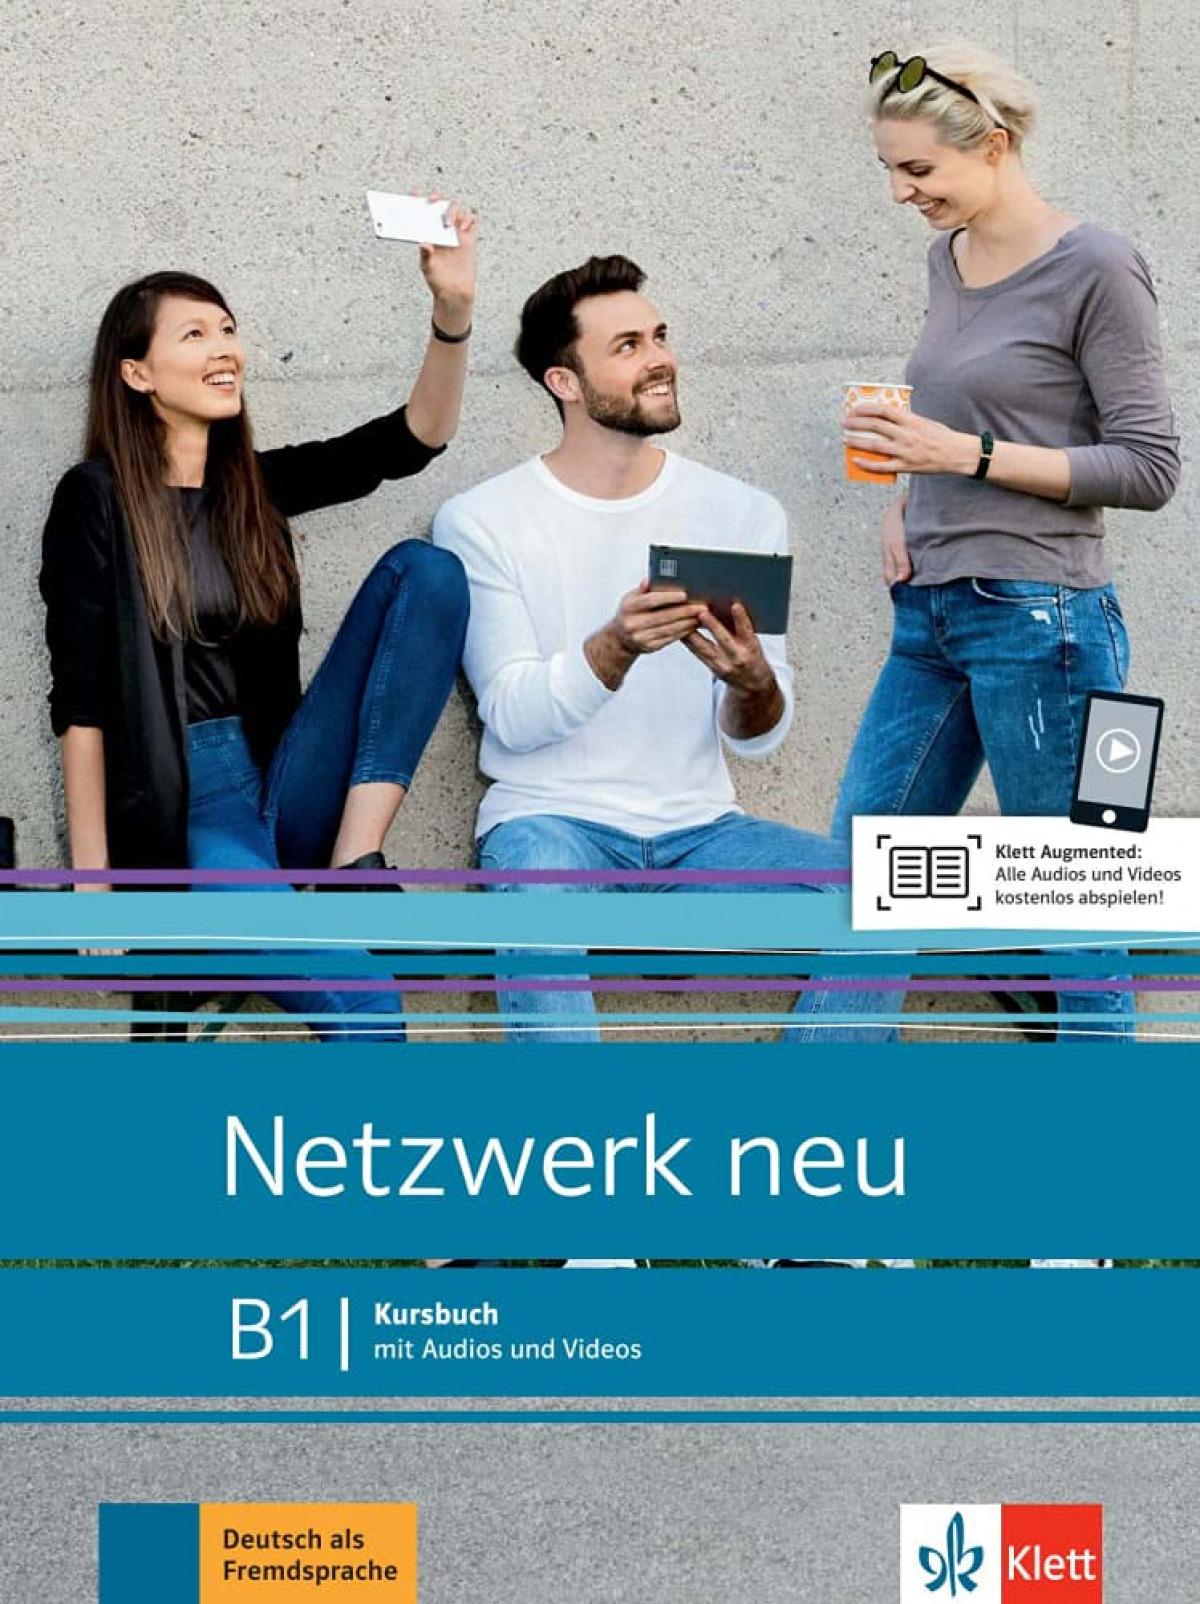 Netzwerk neu b1 libro del alumno + audio + video